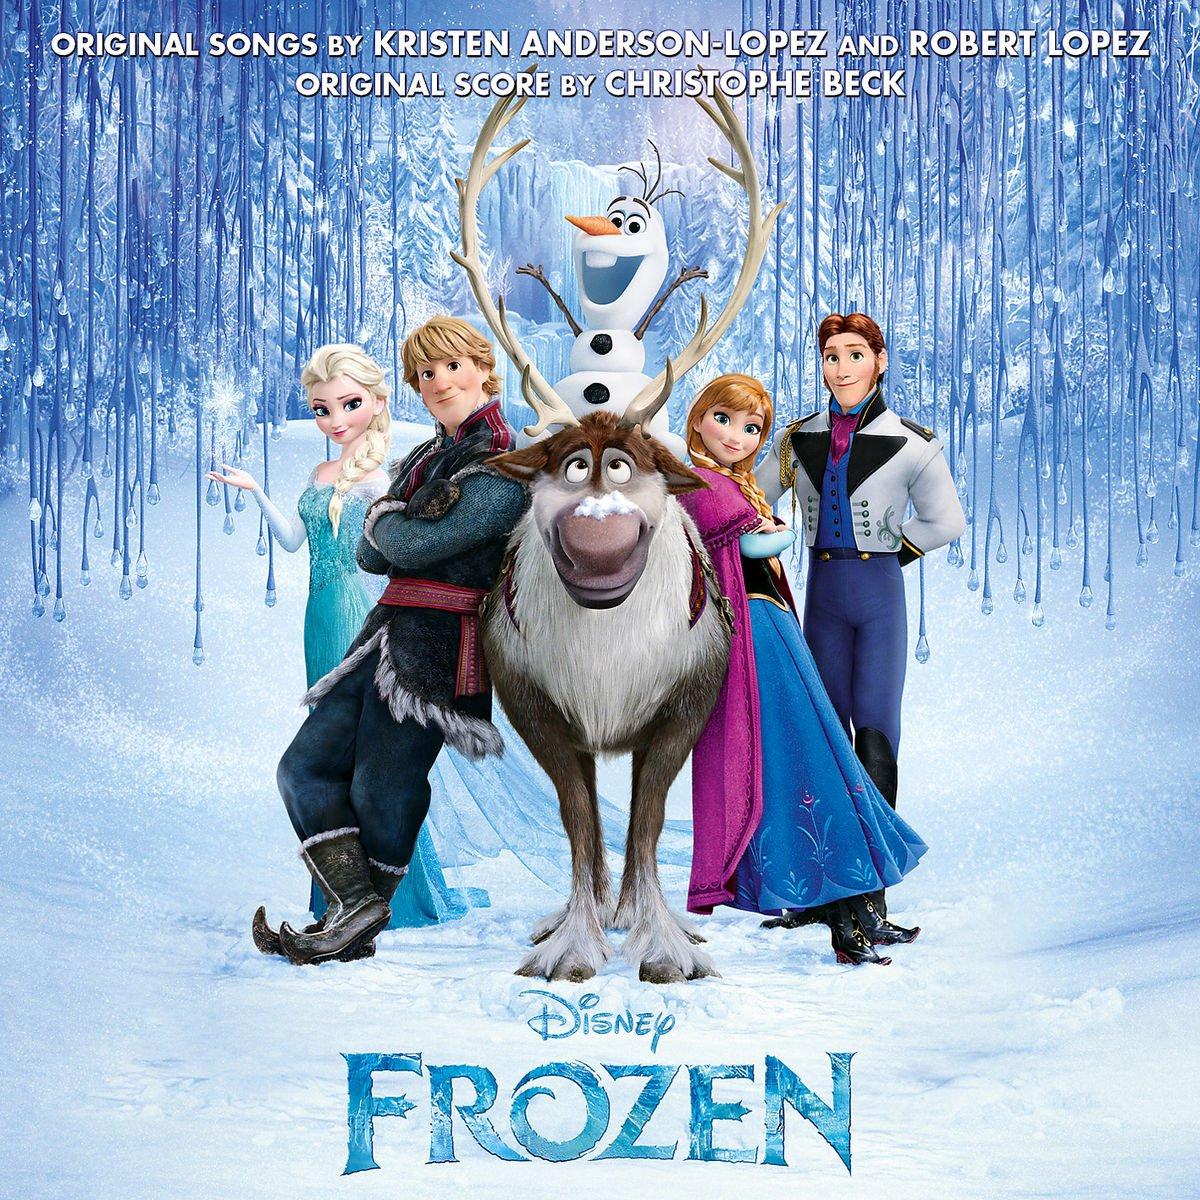 Frozen: Amazon.co.uk: Music